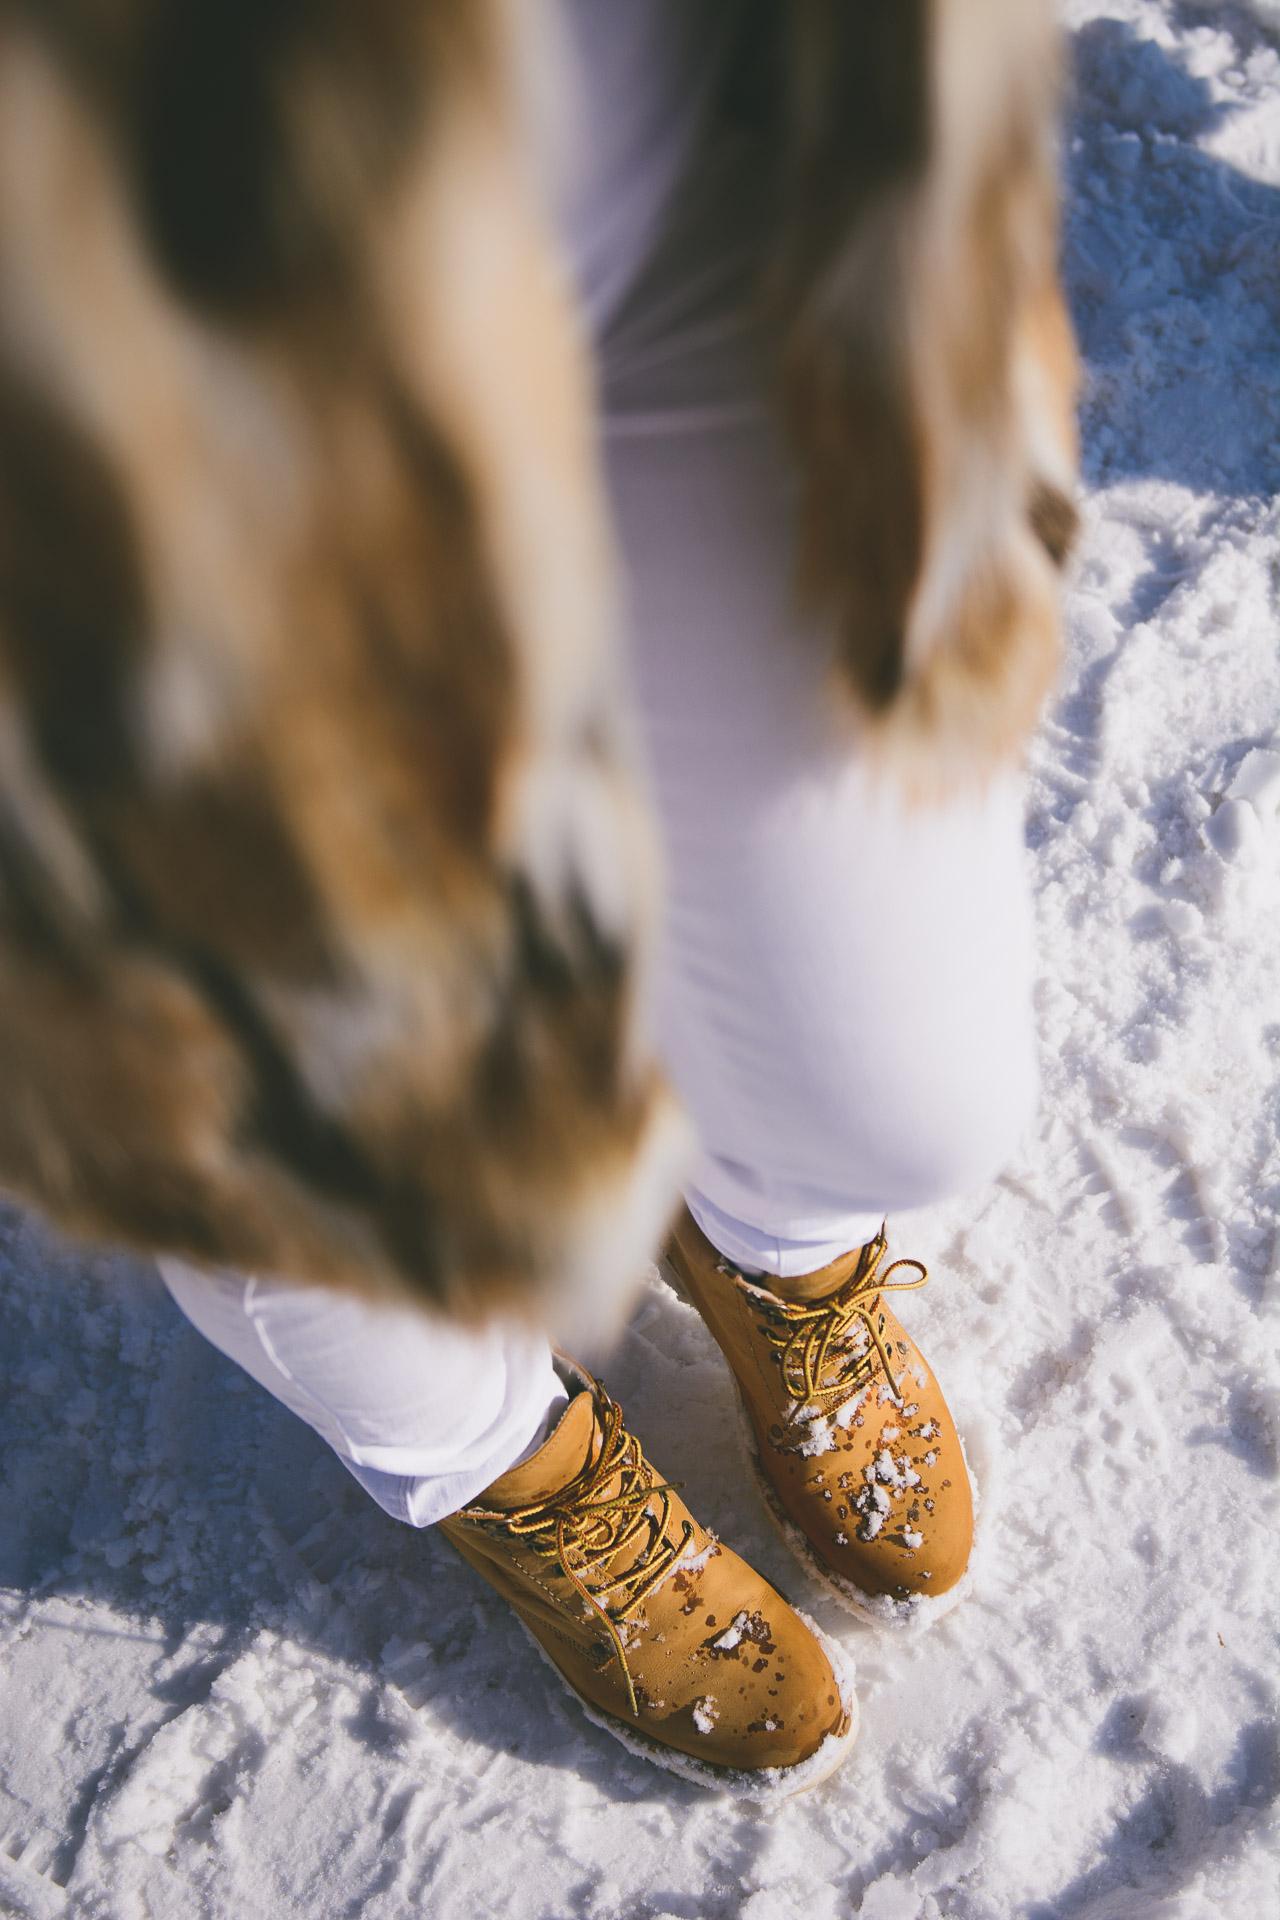 Snow shoes warm